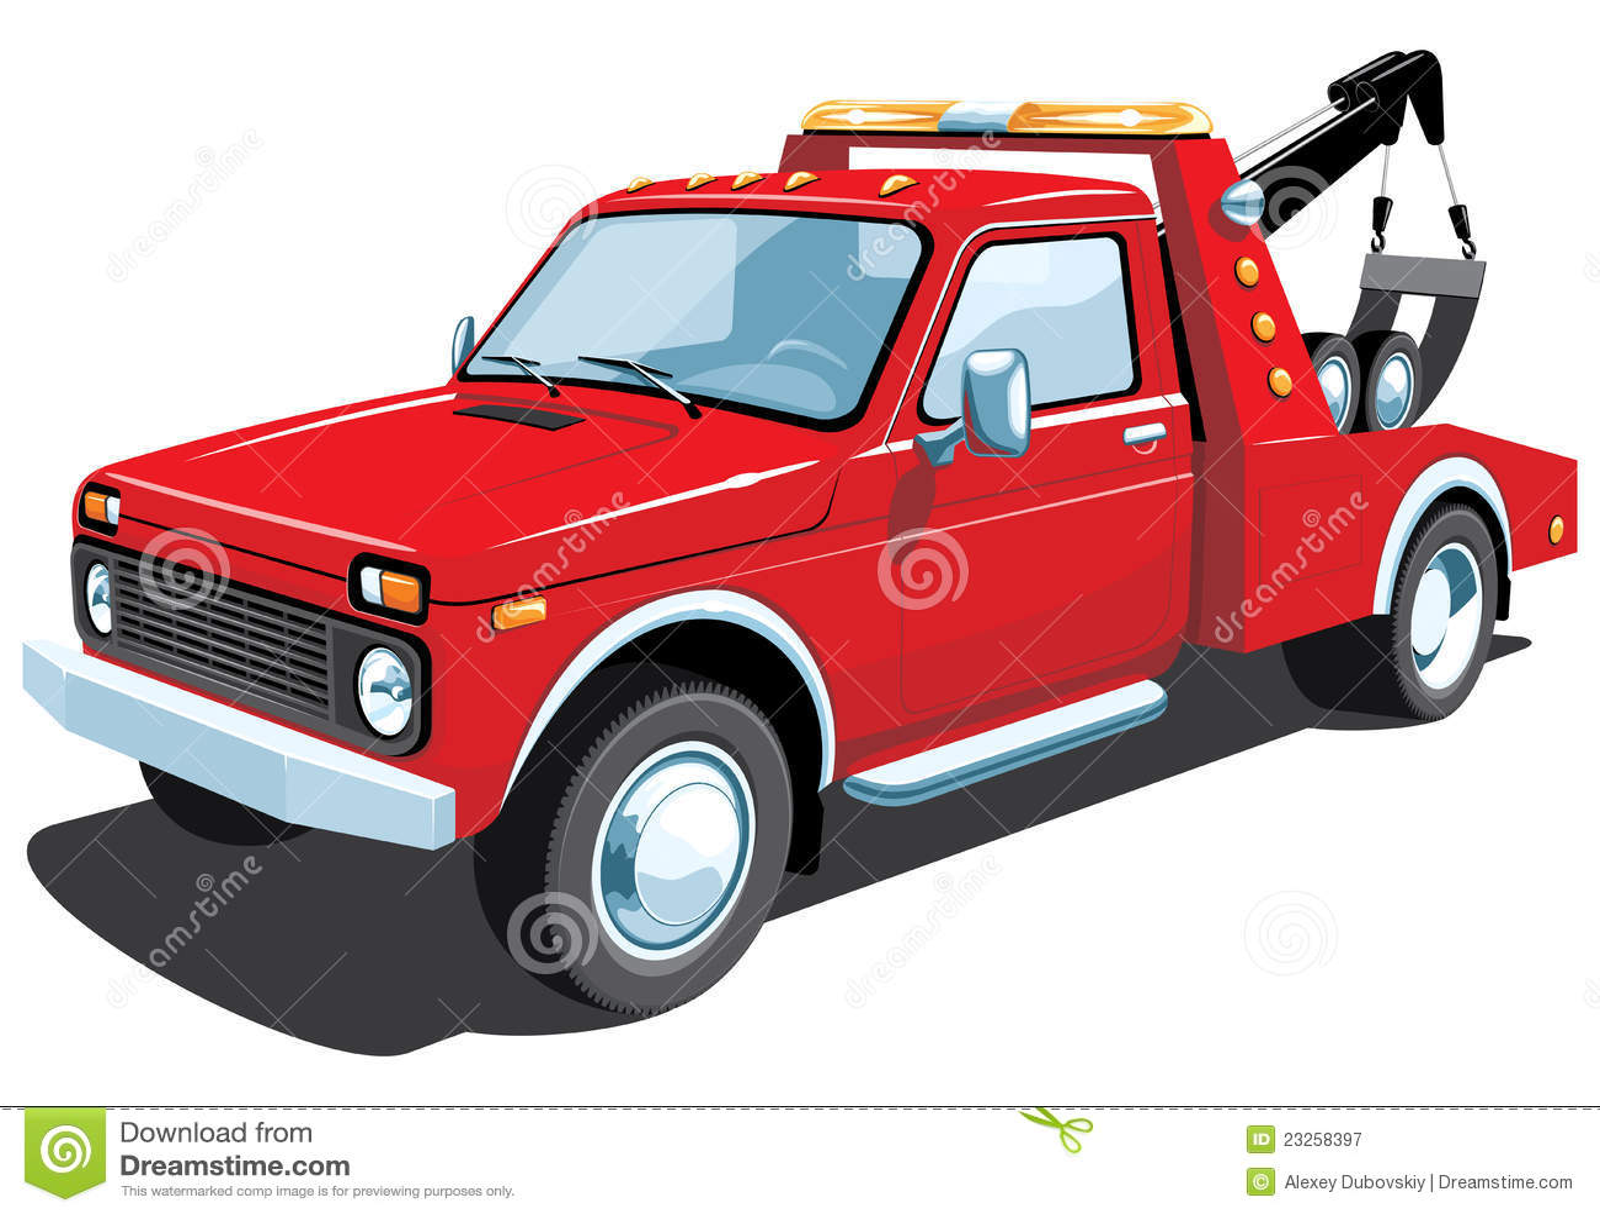 red tow truck stock vector illustration of pick transport 23258397. Black Bedroom Furniture Sets. Home Design Ideas